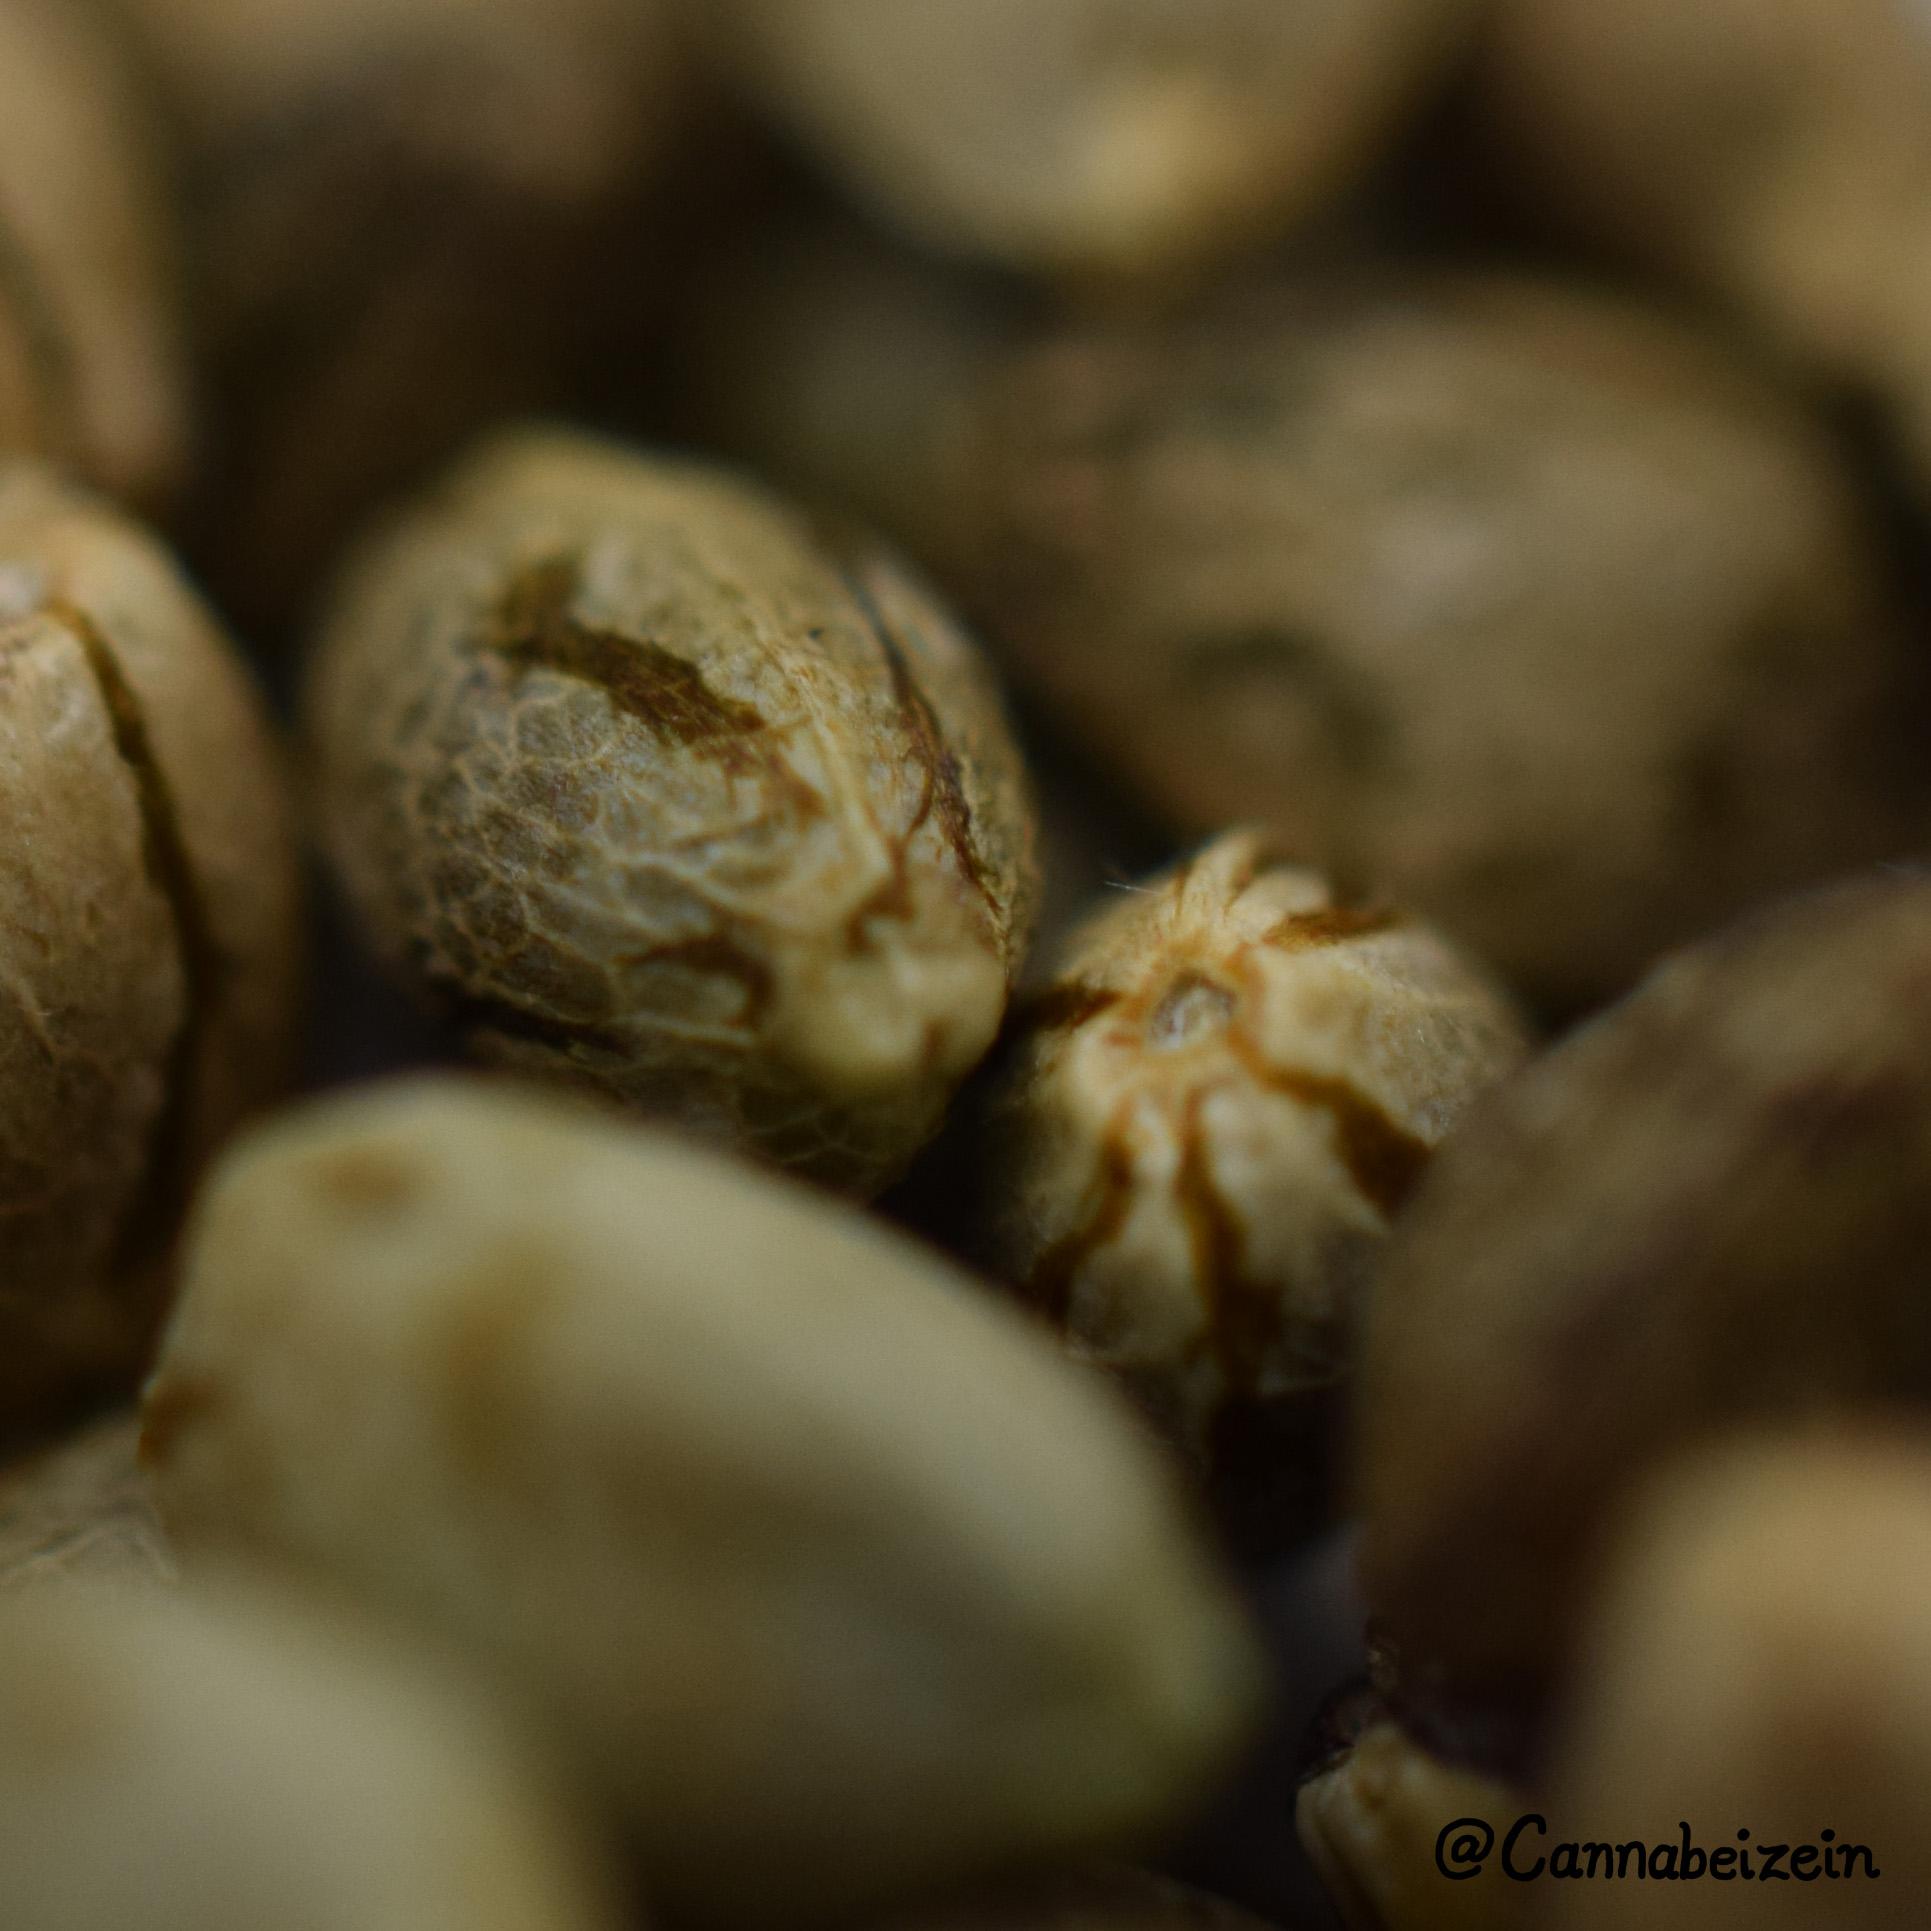 Cannabeizein 0232 - Mystery Mix Seeds - DSC_0828 copy.jpg